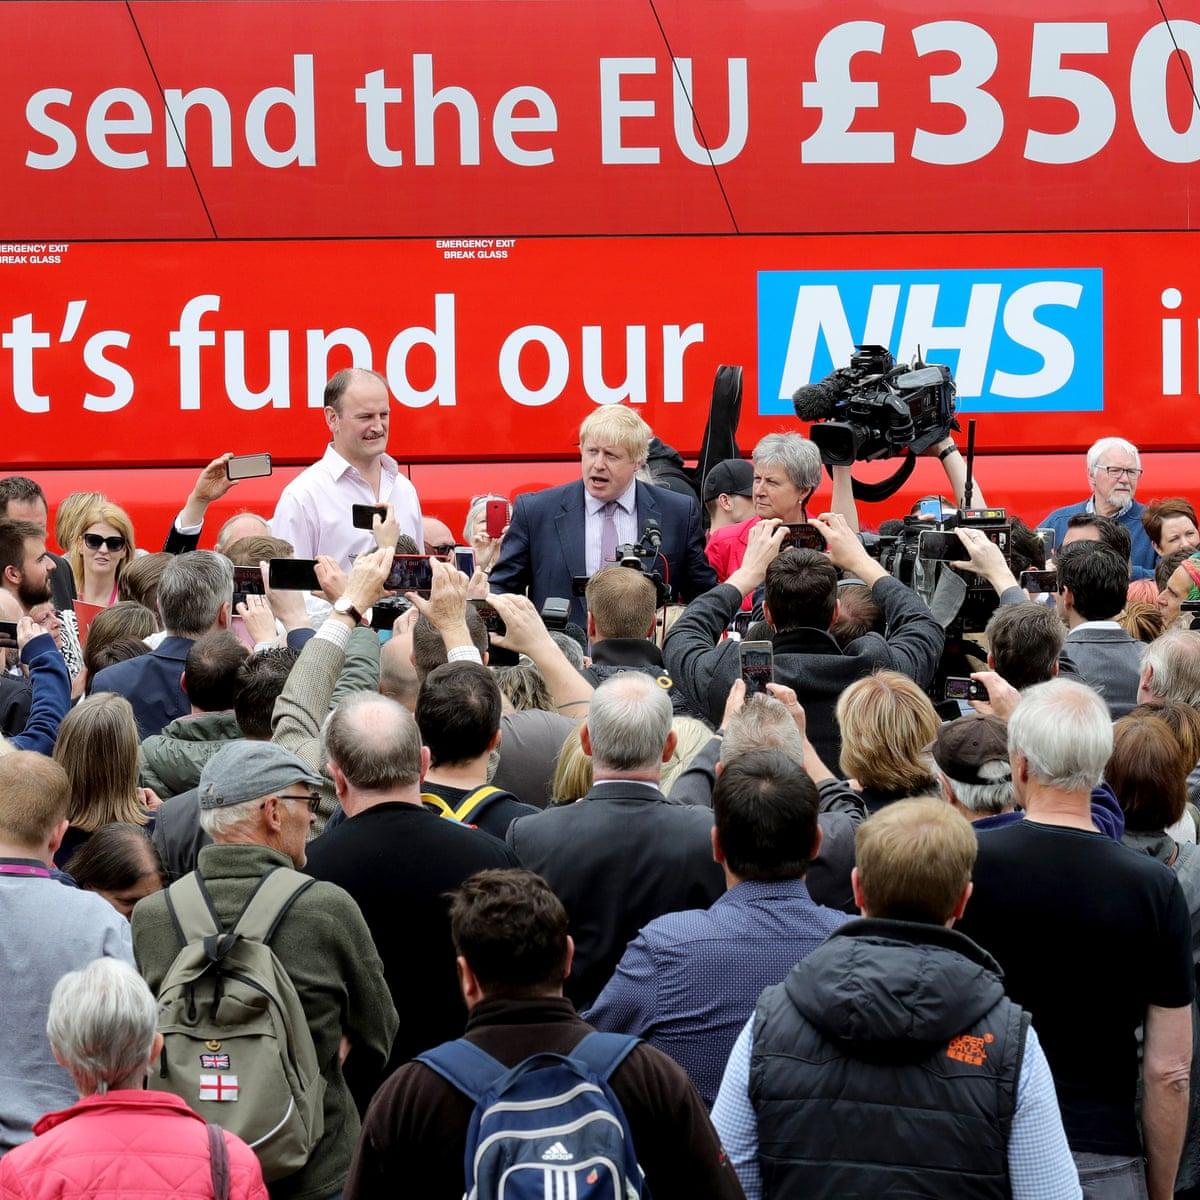 In campaign eu referendum betting betting terms plus minus symbol